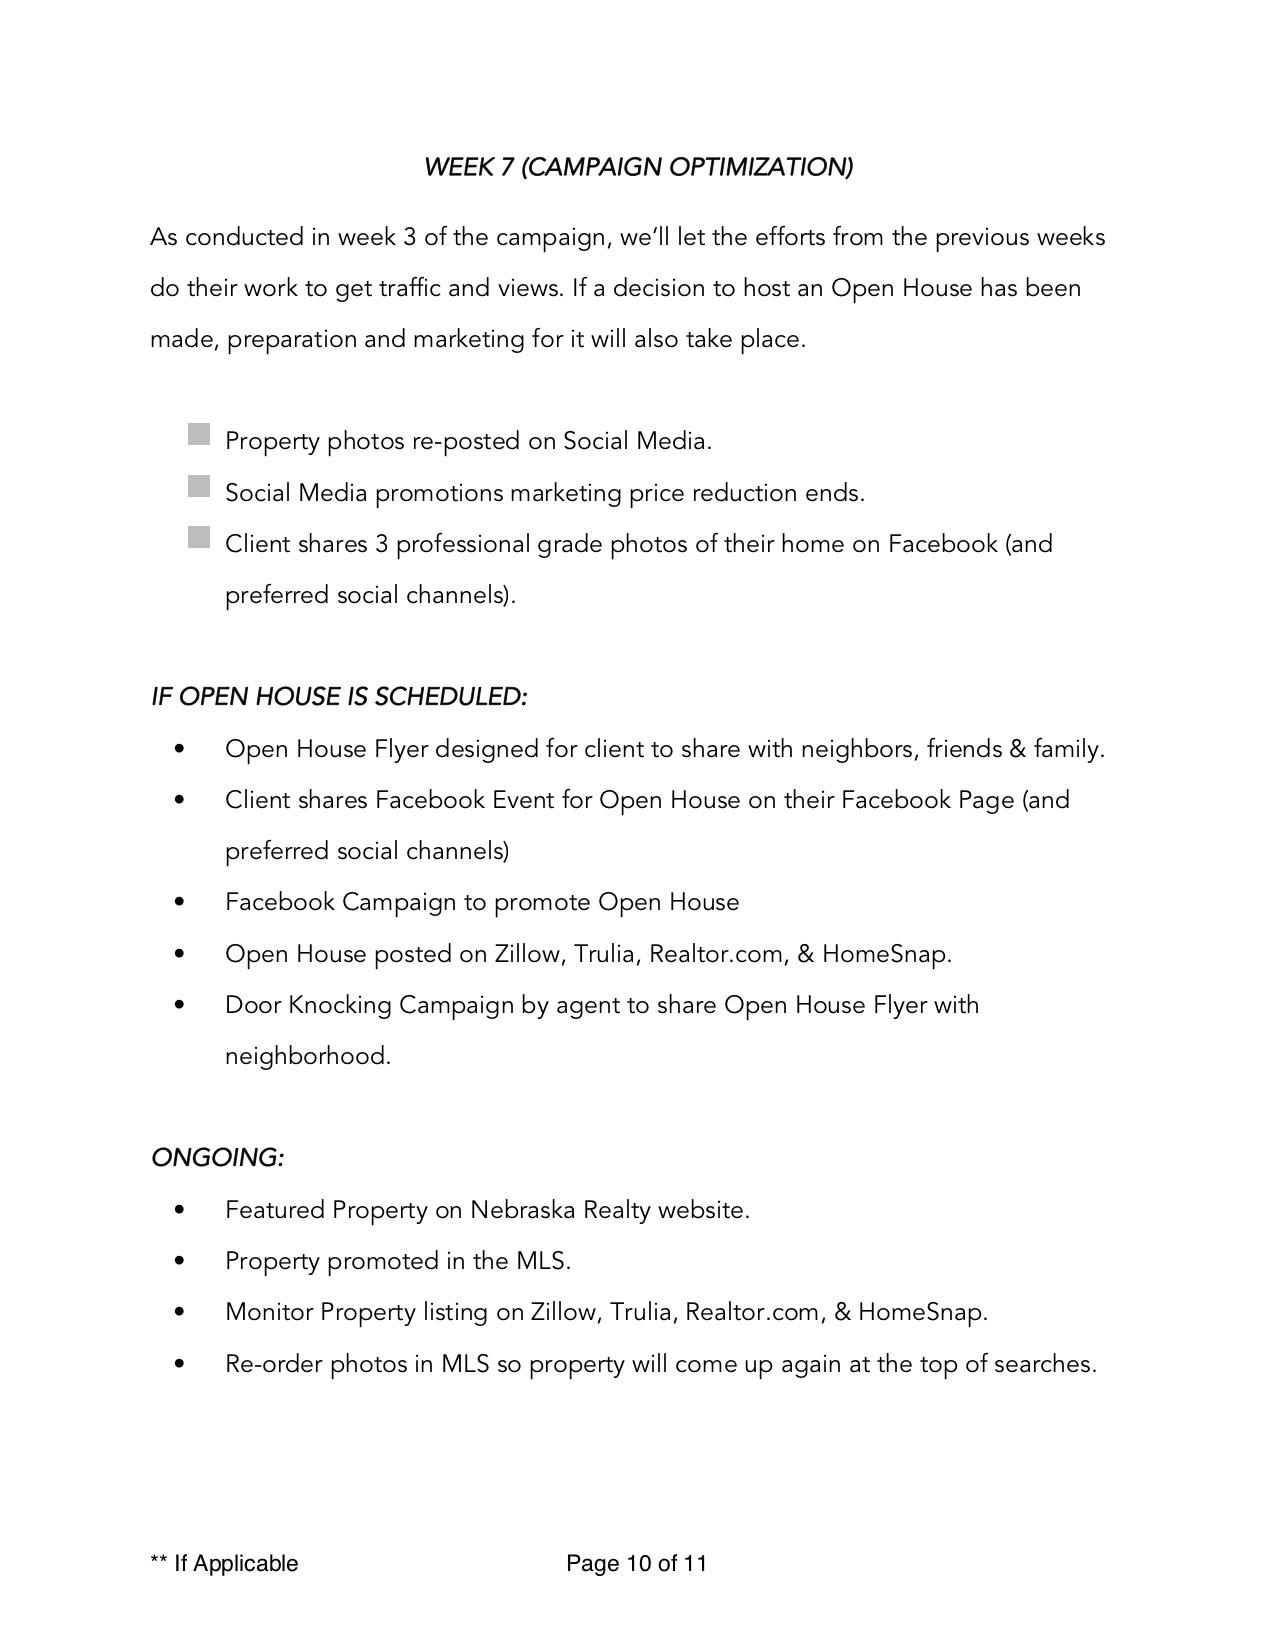 8 Week Marketing Plan10.jpg